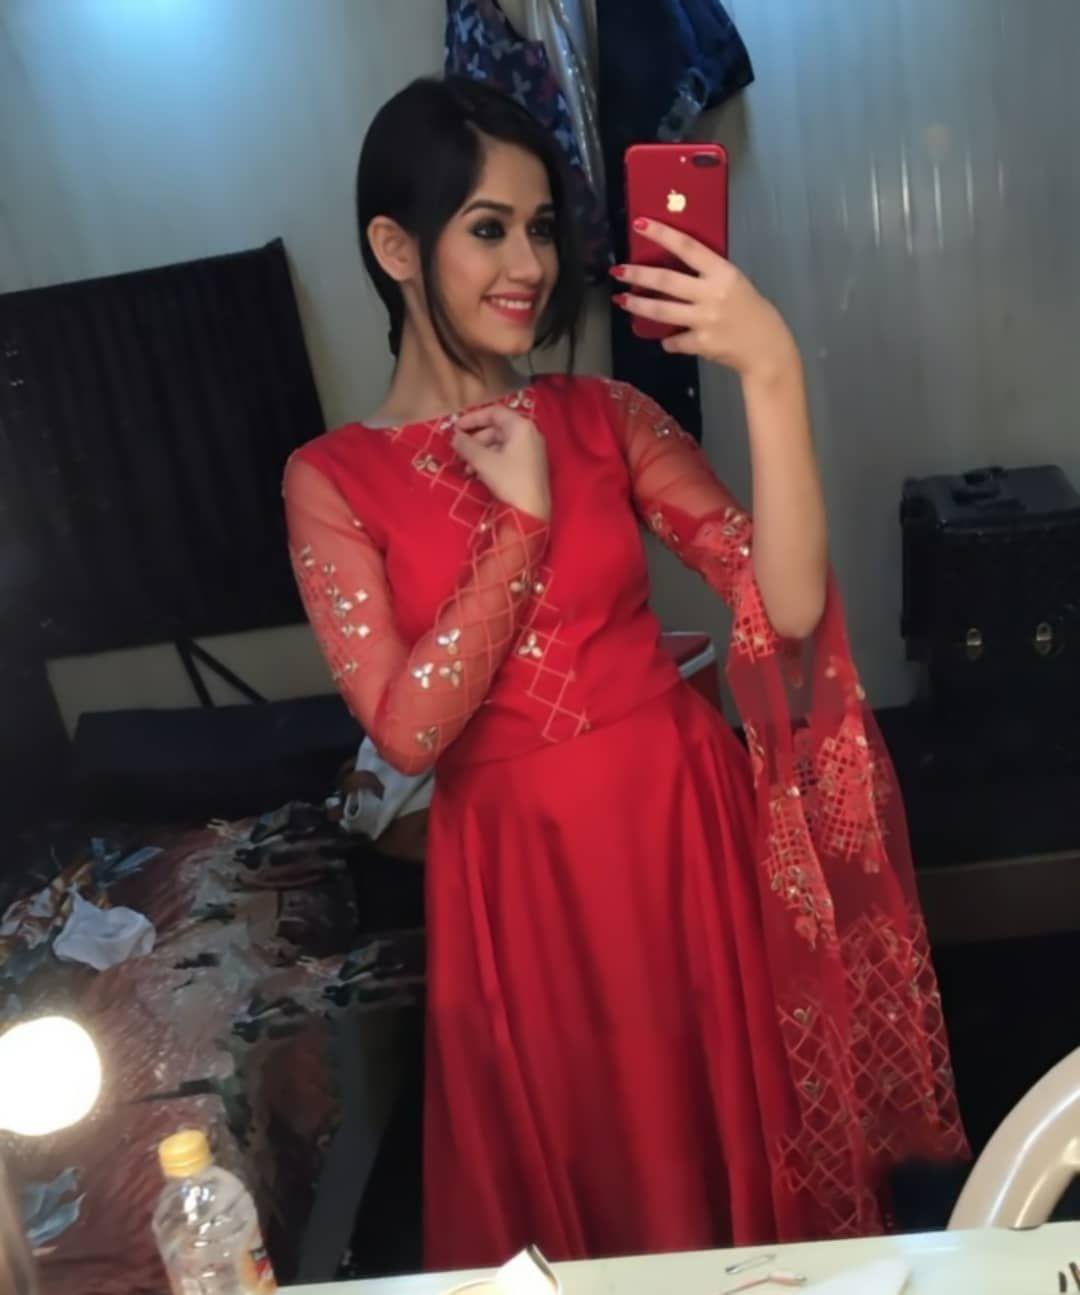 Jannat zubair pink dress  Pin by Wajiha  on Anushka And Jannat  Pinterest  Crazy fans